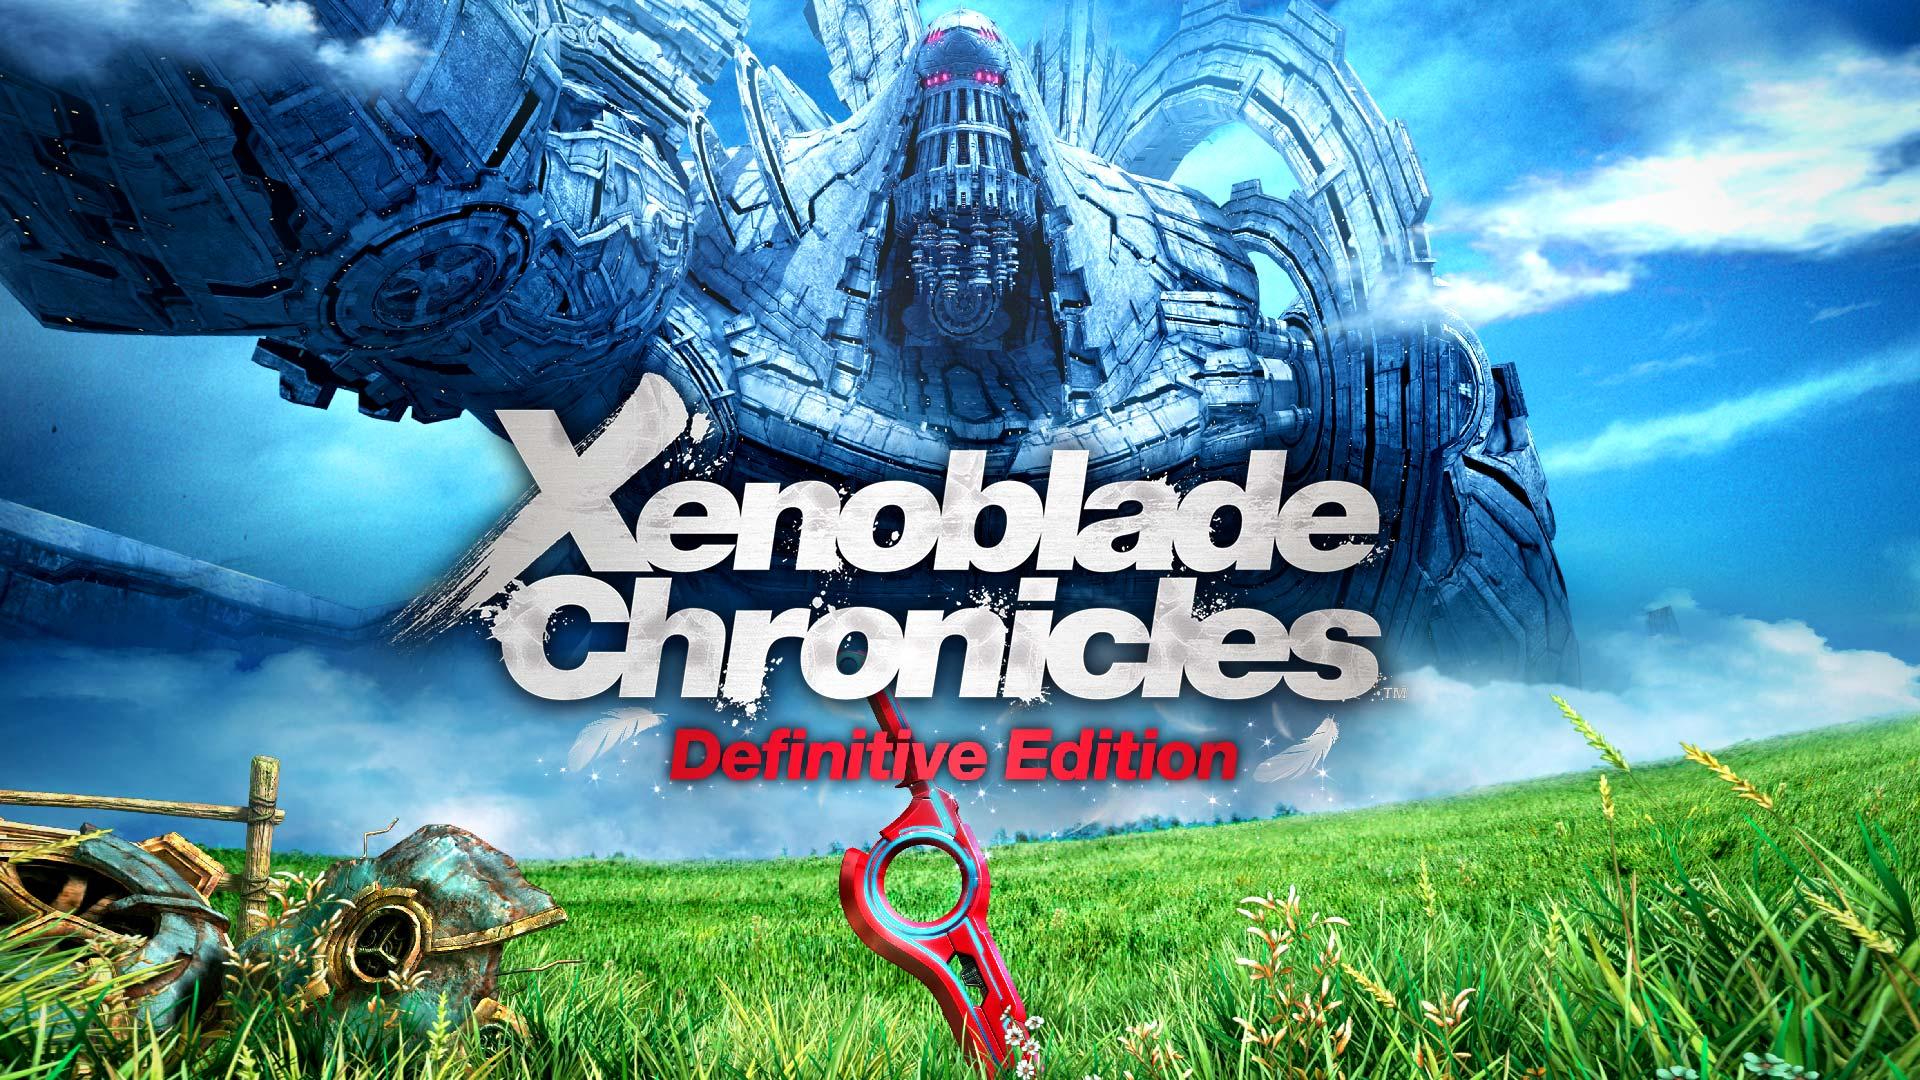 Nintendo Direct Mini Xenoblade Chronicles Definitive Edition release date more news